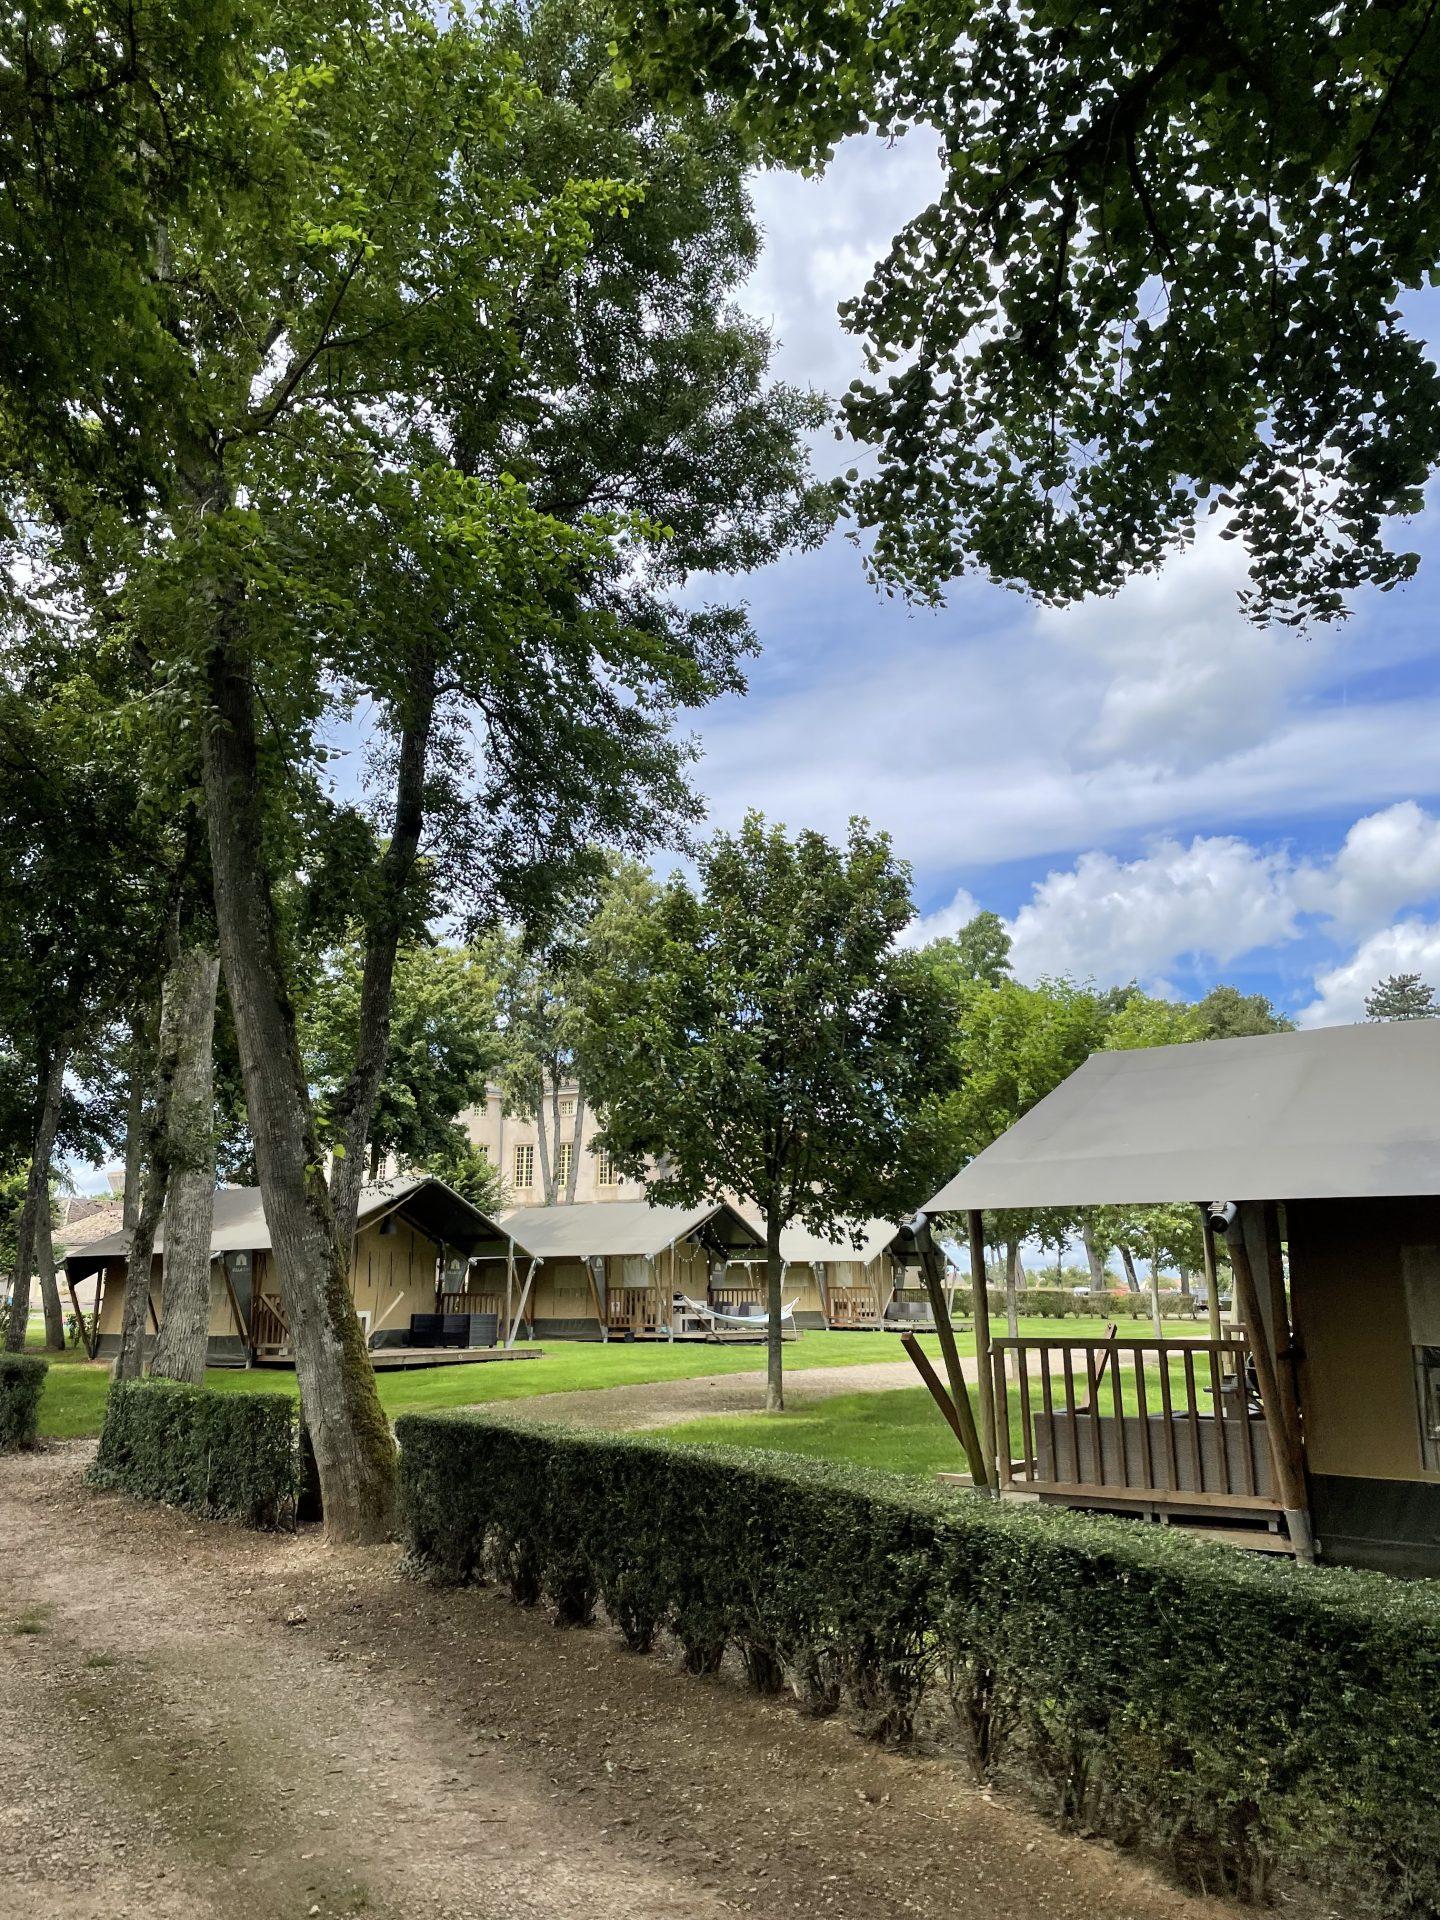 villatent camping Frankrijk Chateau de L'Epervier